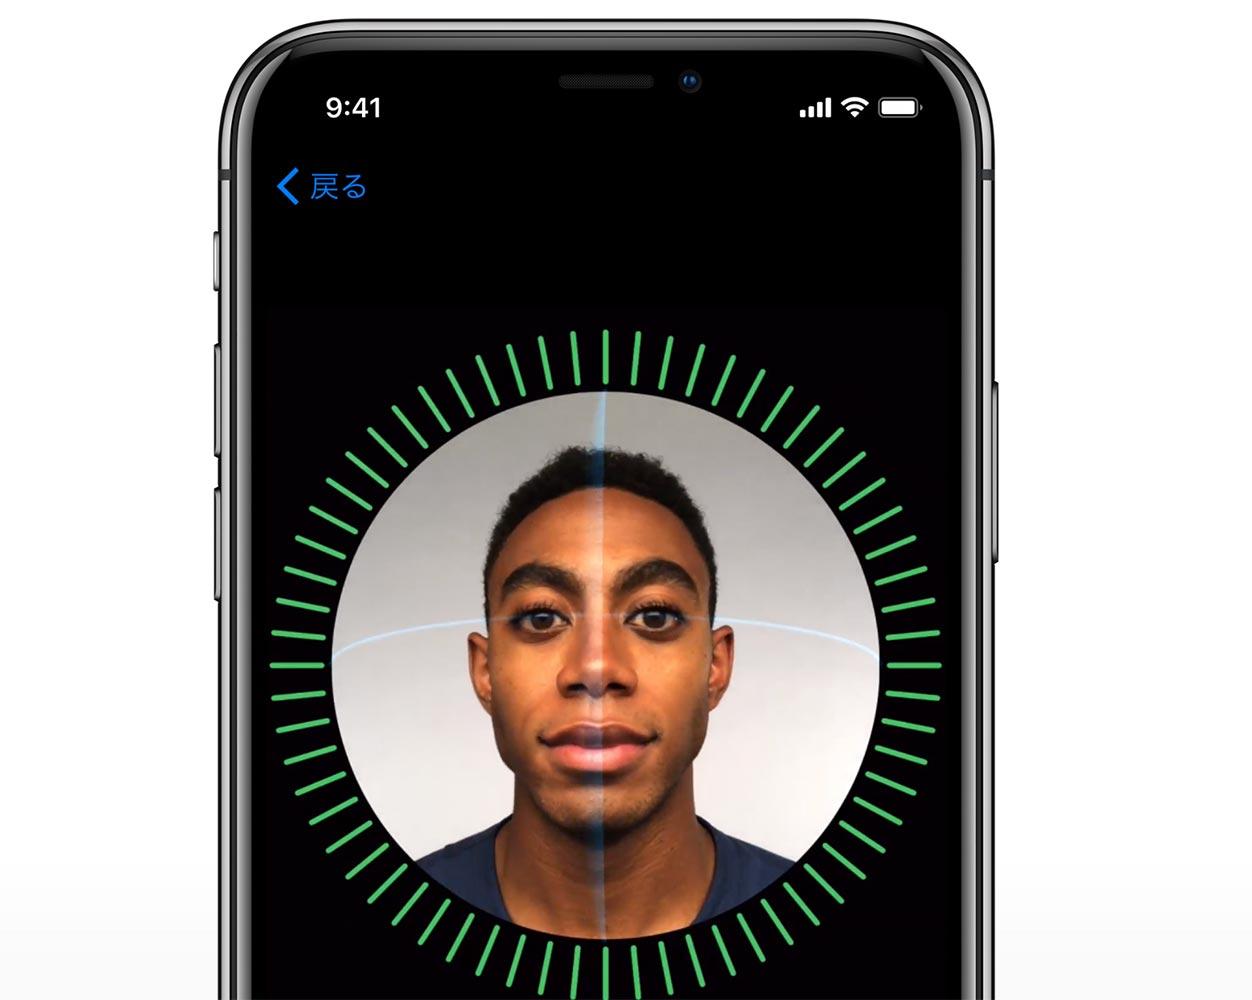 AppleのCraig Federighi氏、「Face ID」のマルチユーザーサポートは現時点では考えていないことを明らかに